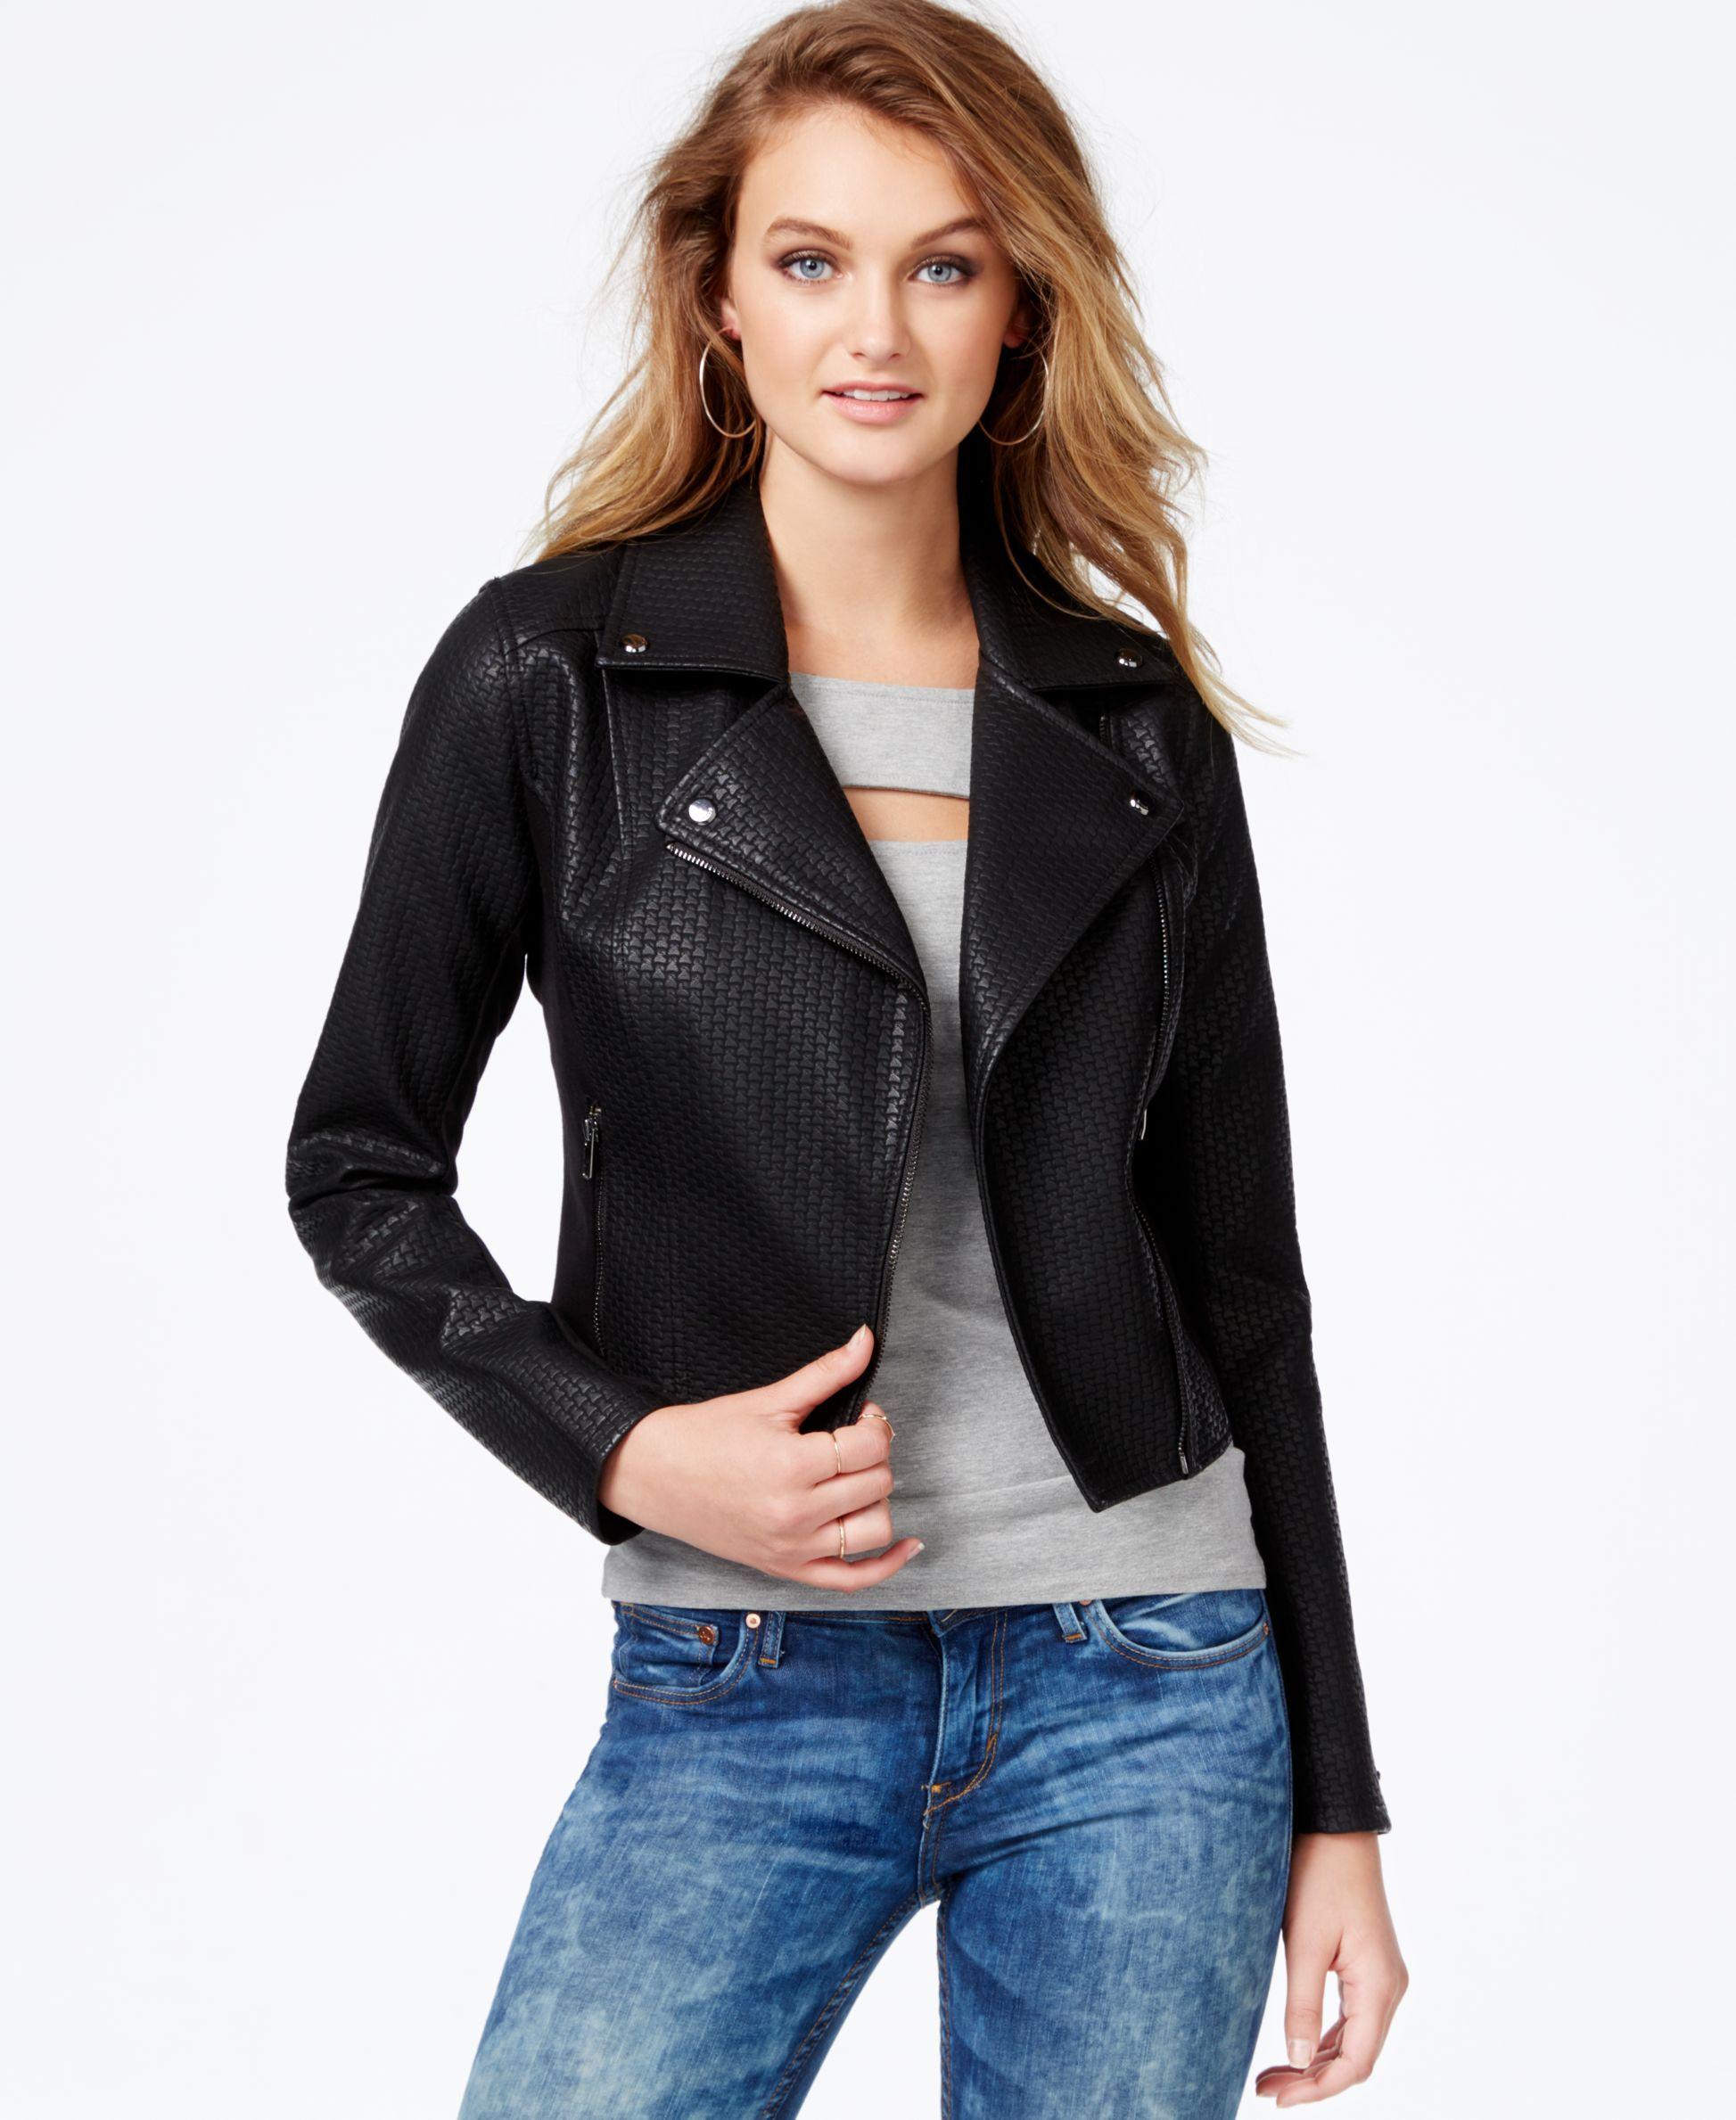 Guess FauxLeather BasketWeave Moto Jacket Black